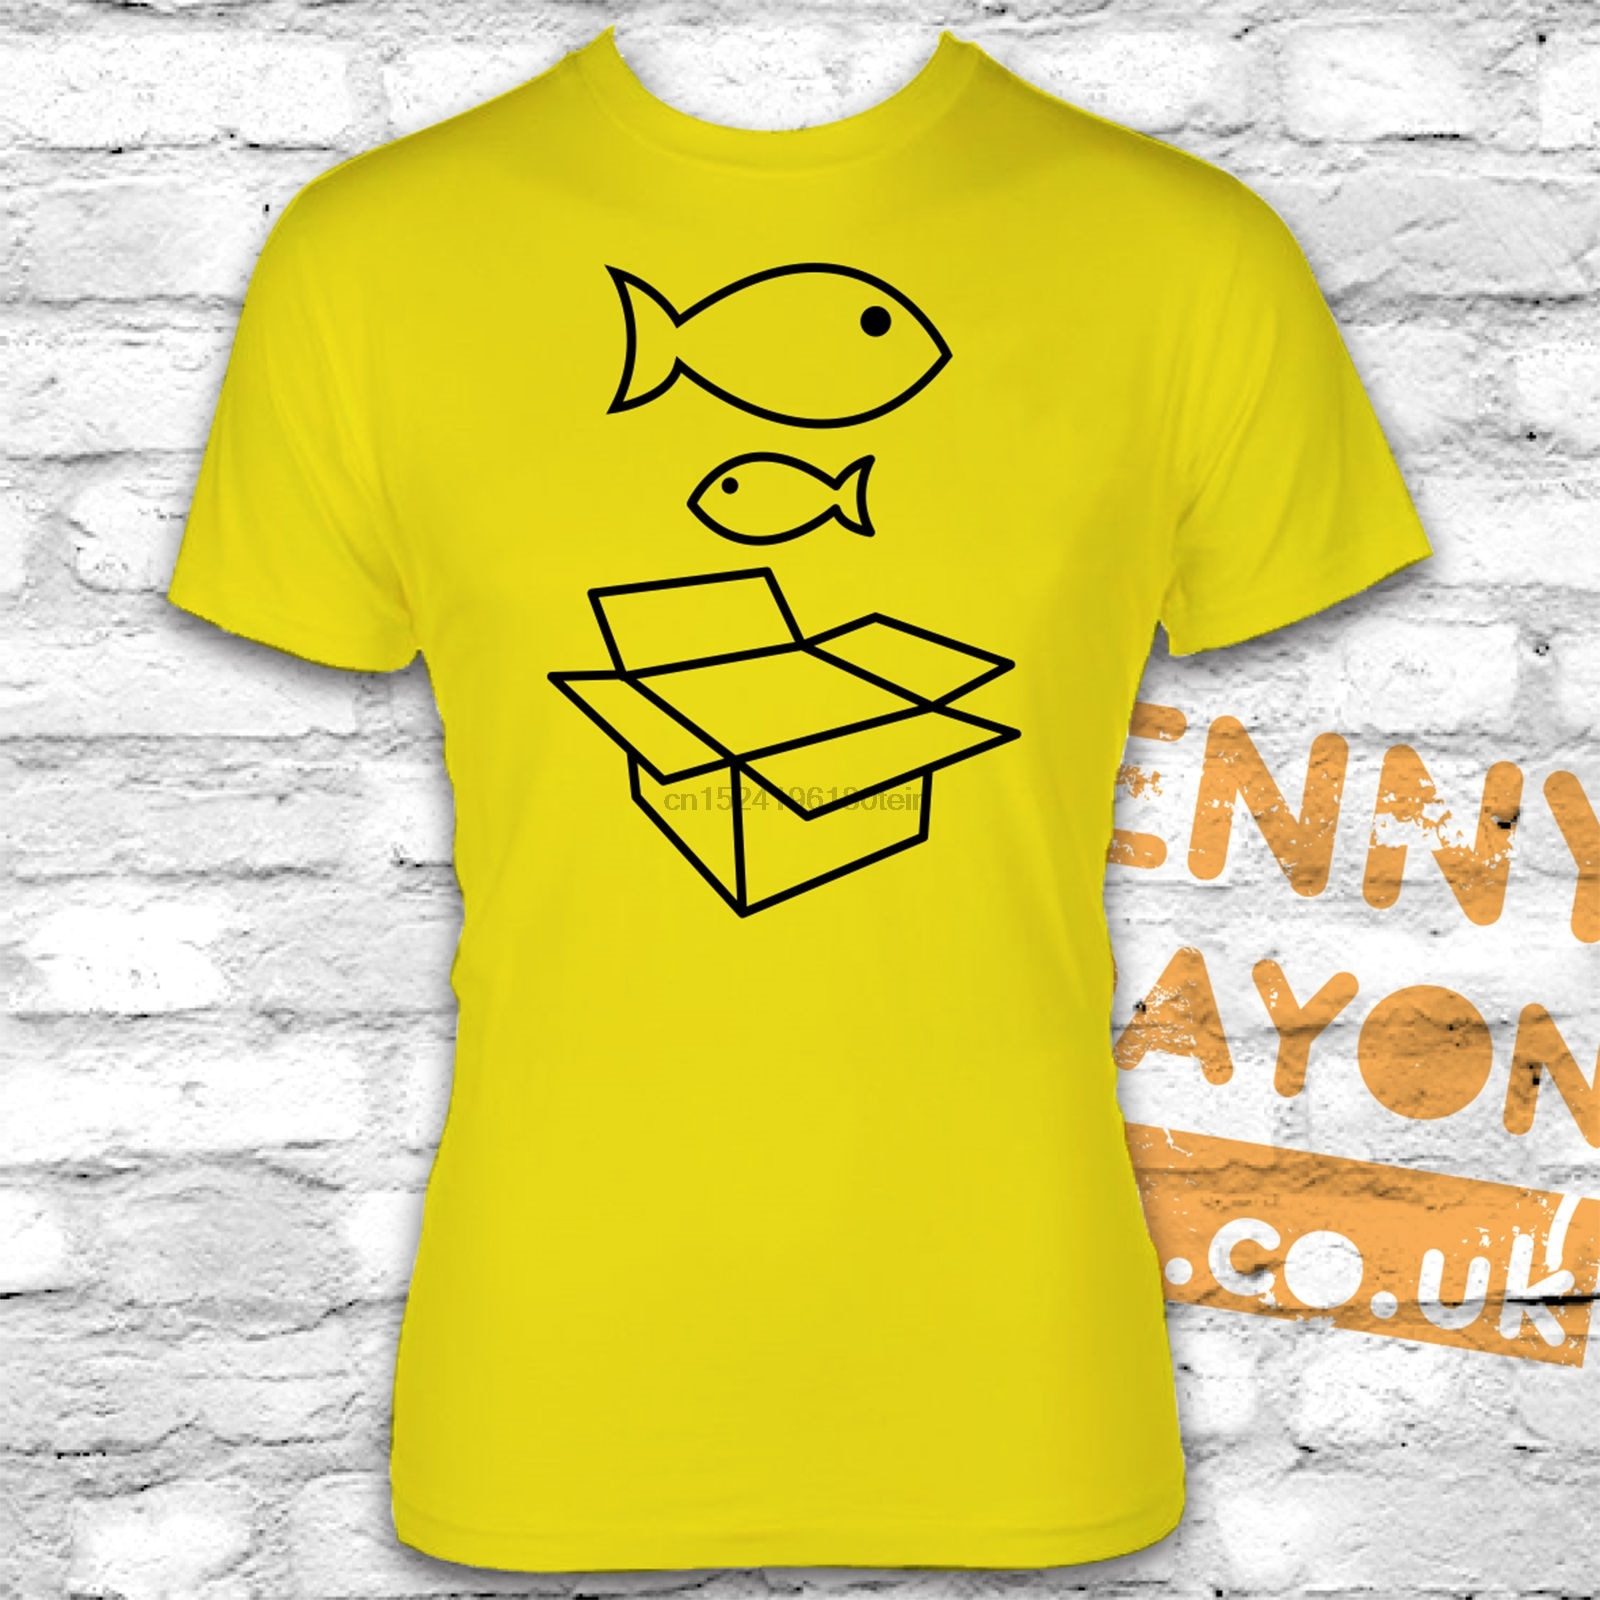 Camiseta de pez grande, caja de cartón, pez pequeño, 90, NINETIES, RAVE GOING OUT, divertida